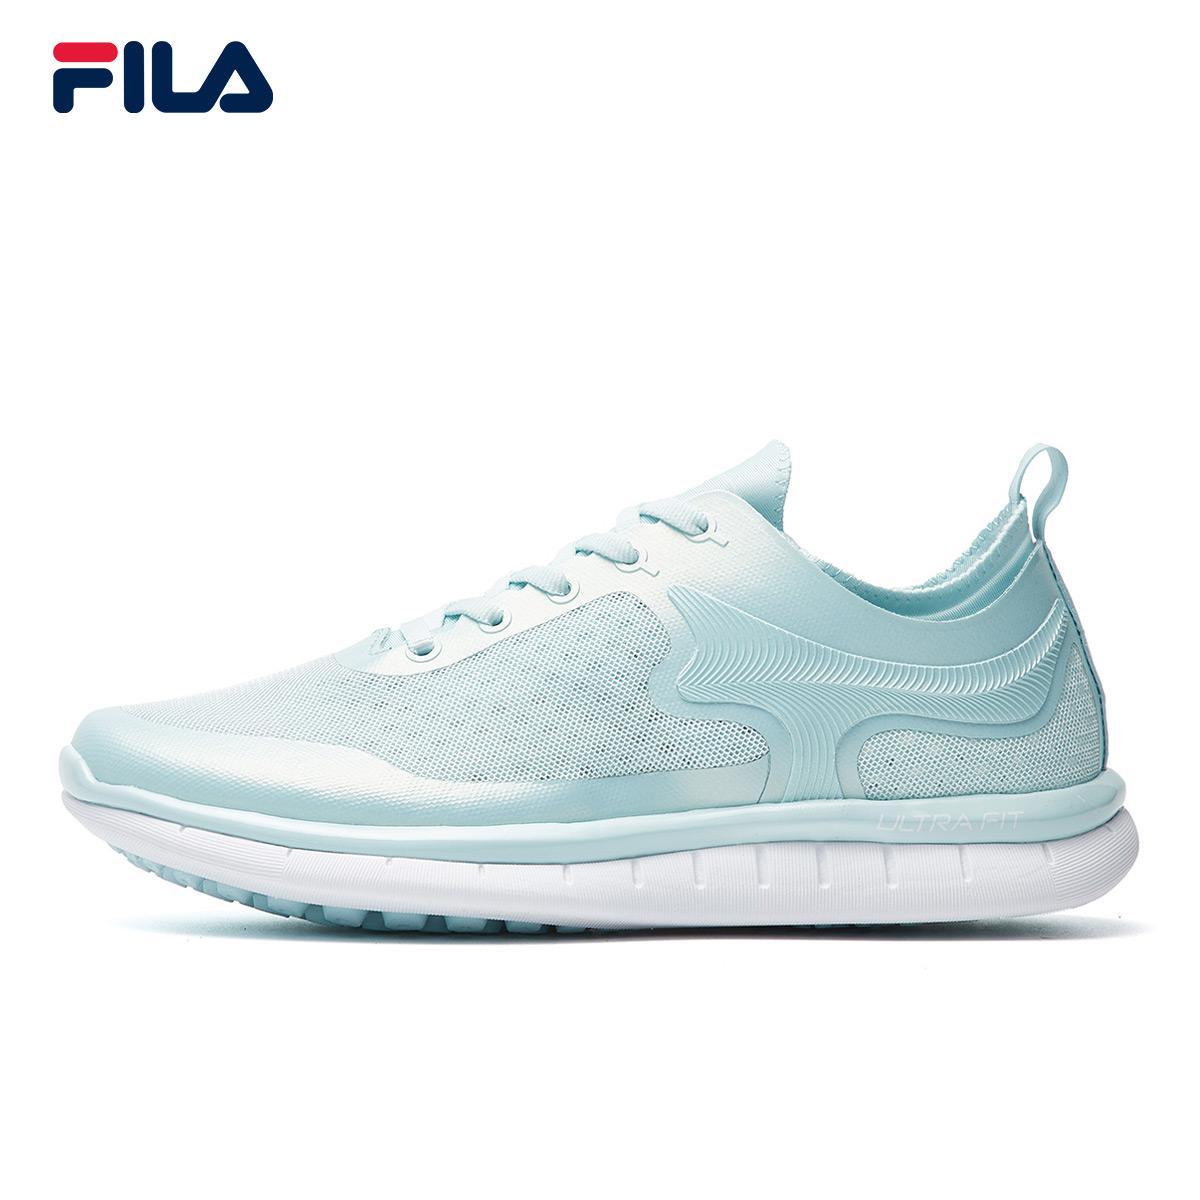 FILA斐乐官方 ULTRA FIT 女子轻质综训鞋 健身训练网面透气跑步女